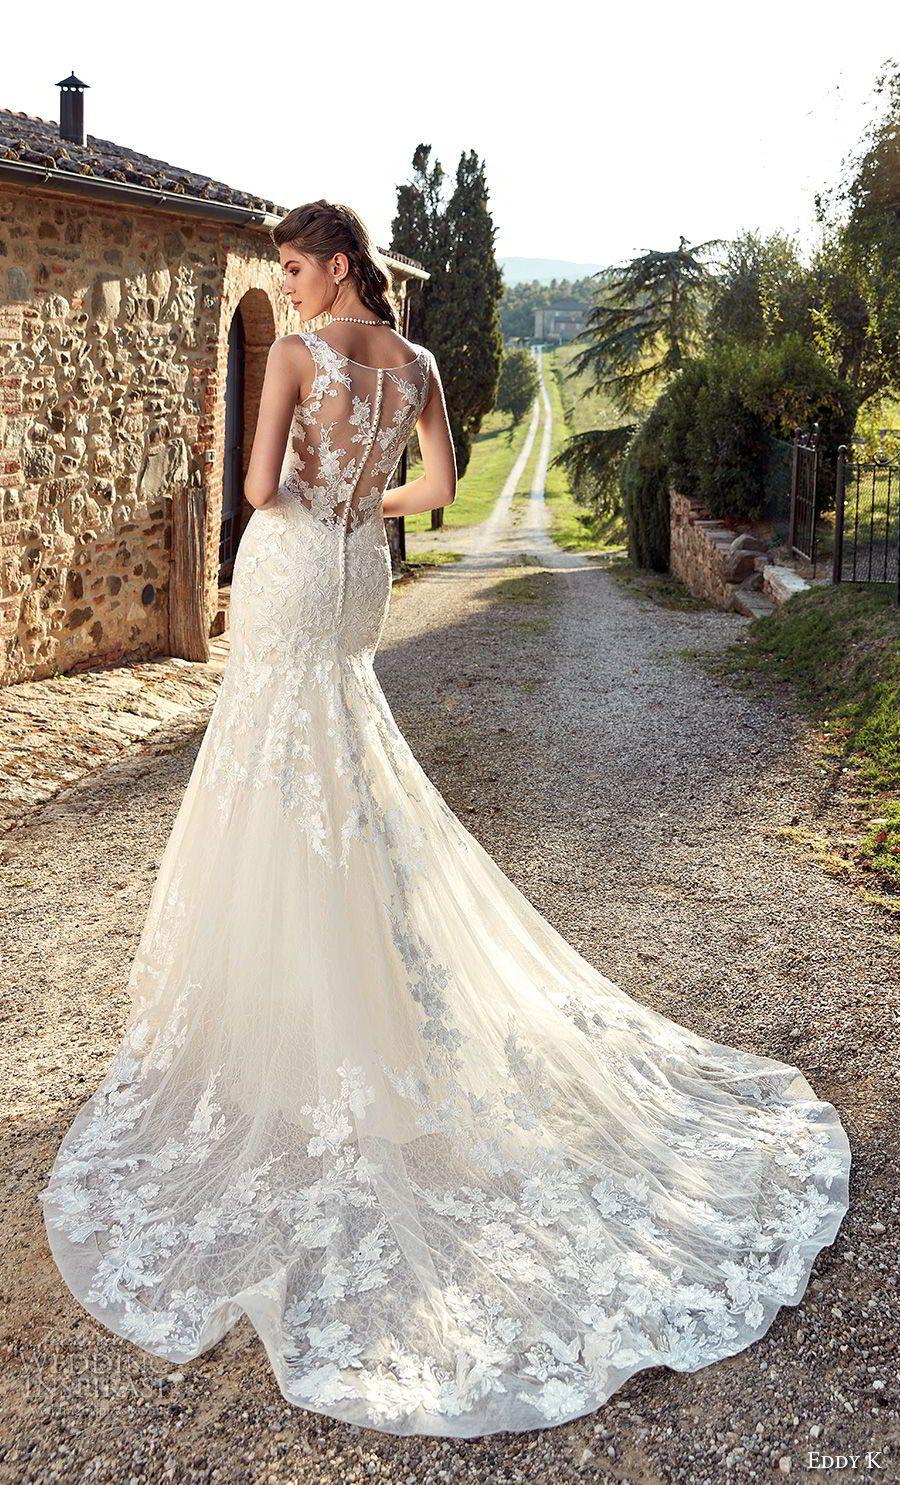 eddy k 2019 ek sleeveless drop waist a line wedding dress sheer lace button  back chapel train (24) bv mv -- Eddy K. 2019 Wedding Dresses 8dc05c8b703b